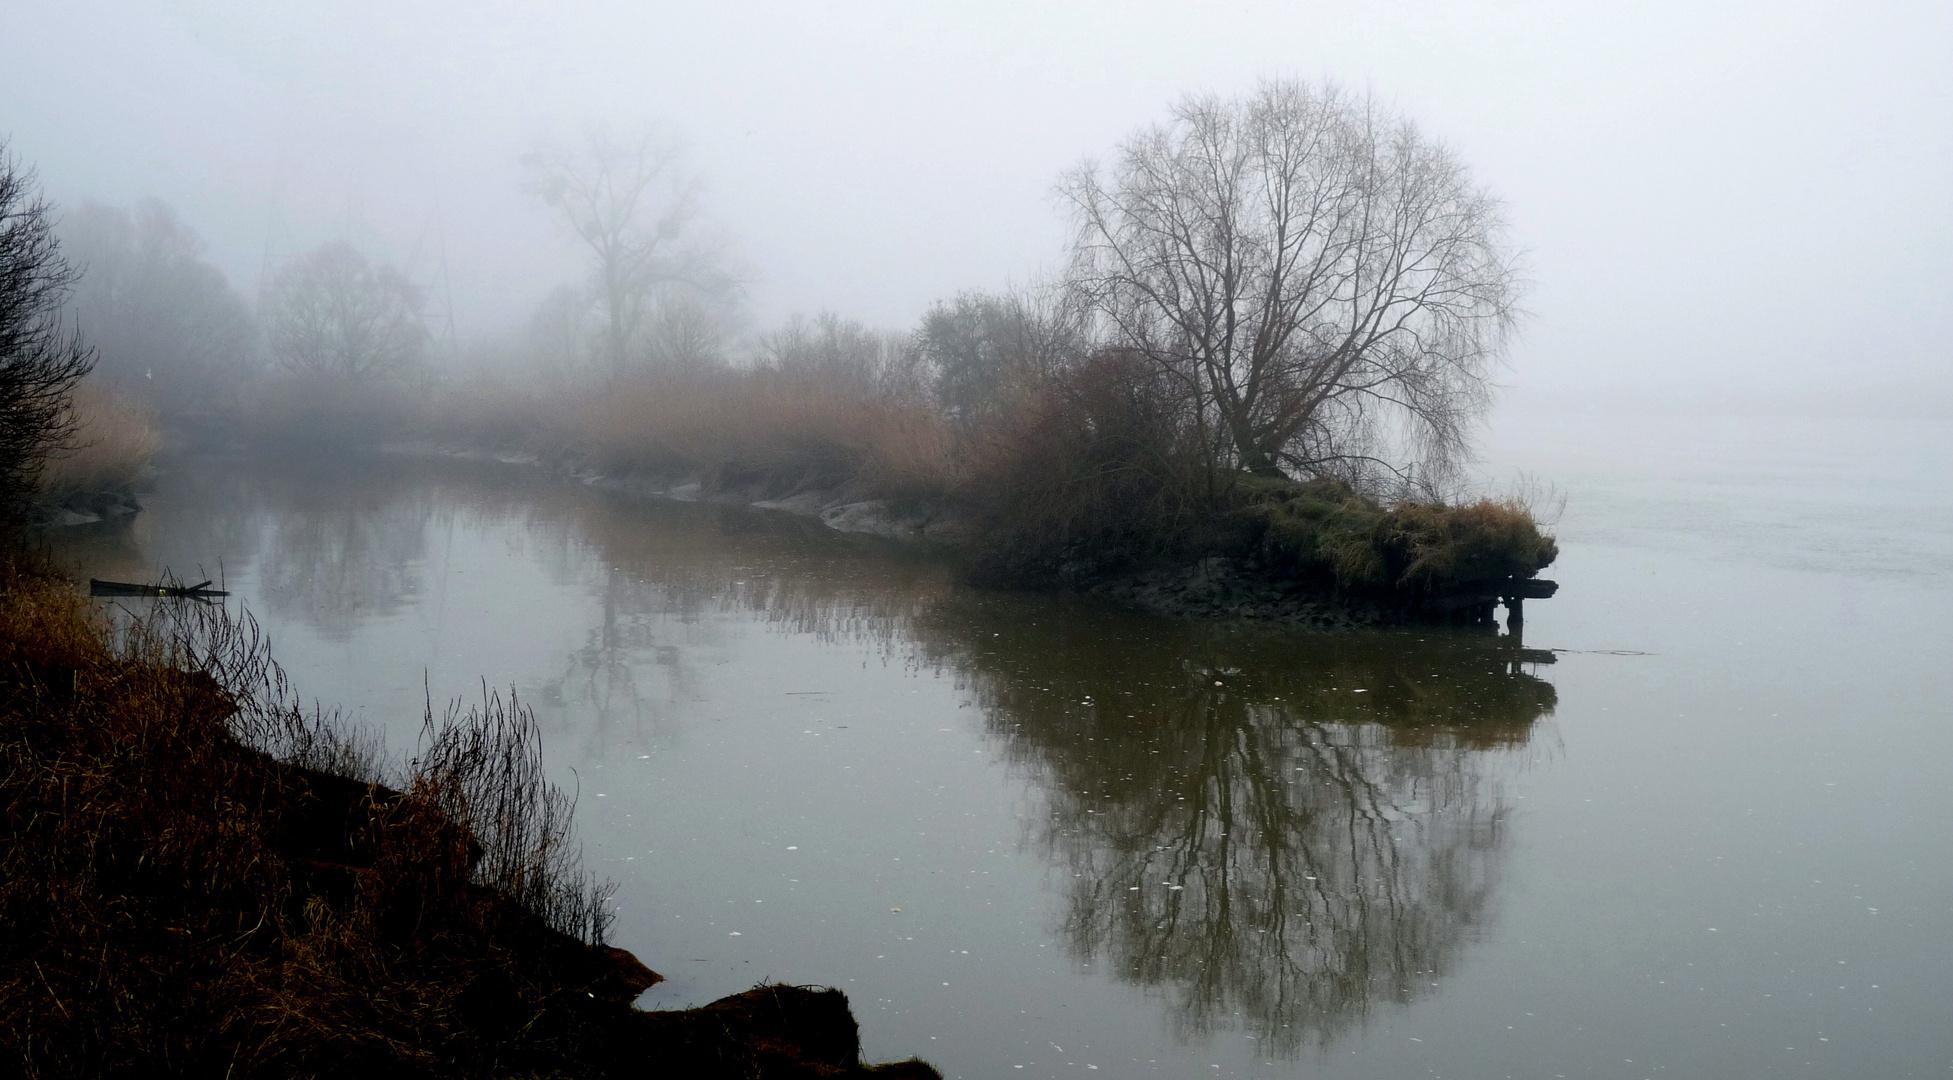 Dans le brouillard.